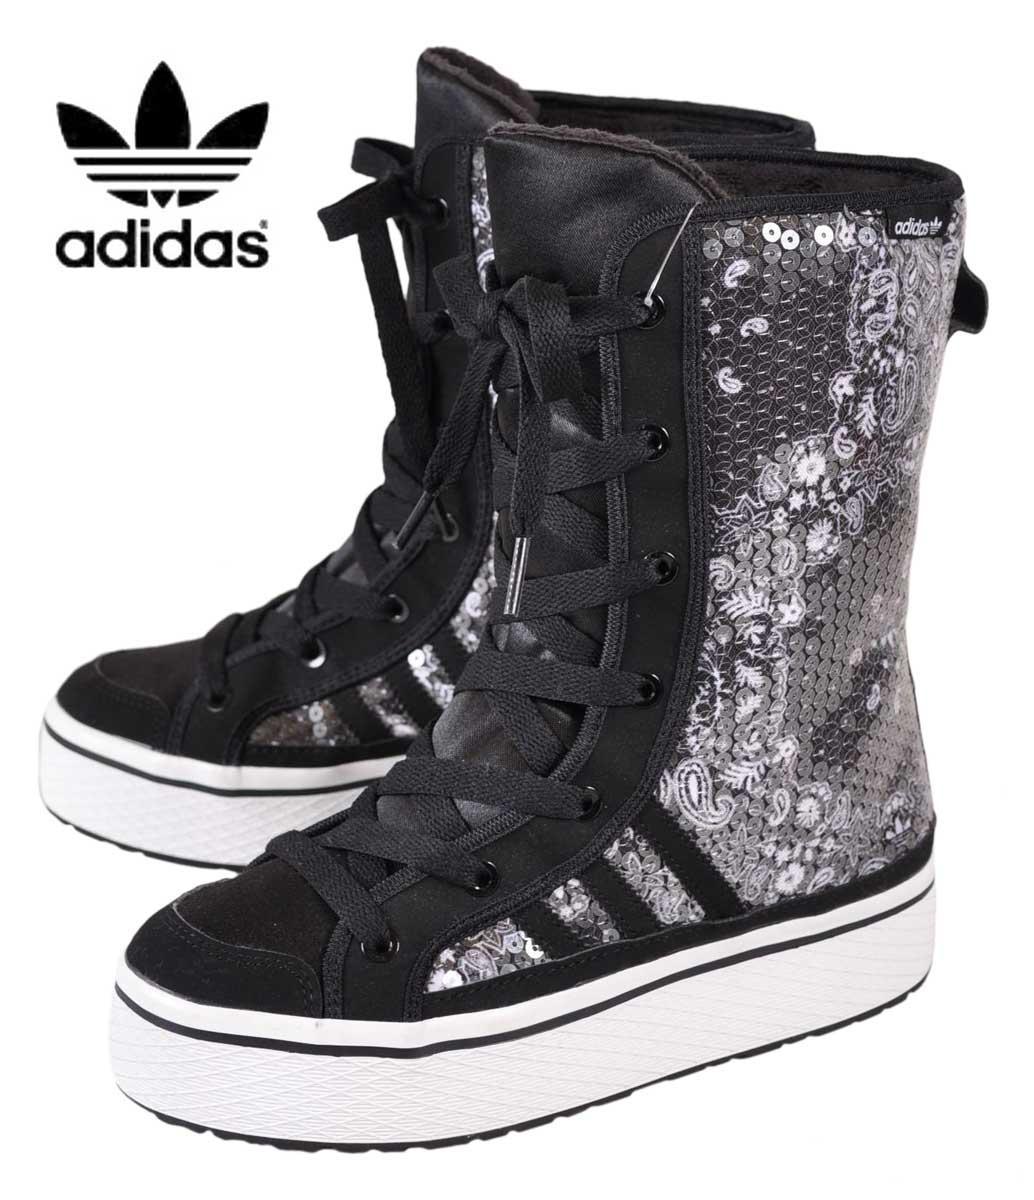 adidas honey 2013 year made / adidas adidas / honey winter 2.0 w hanyu internet 2.0 ZICAHIZ